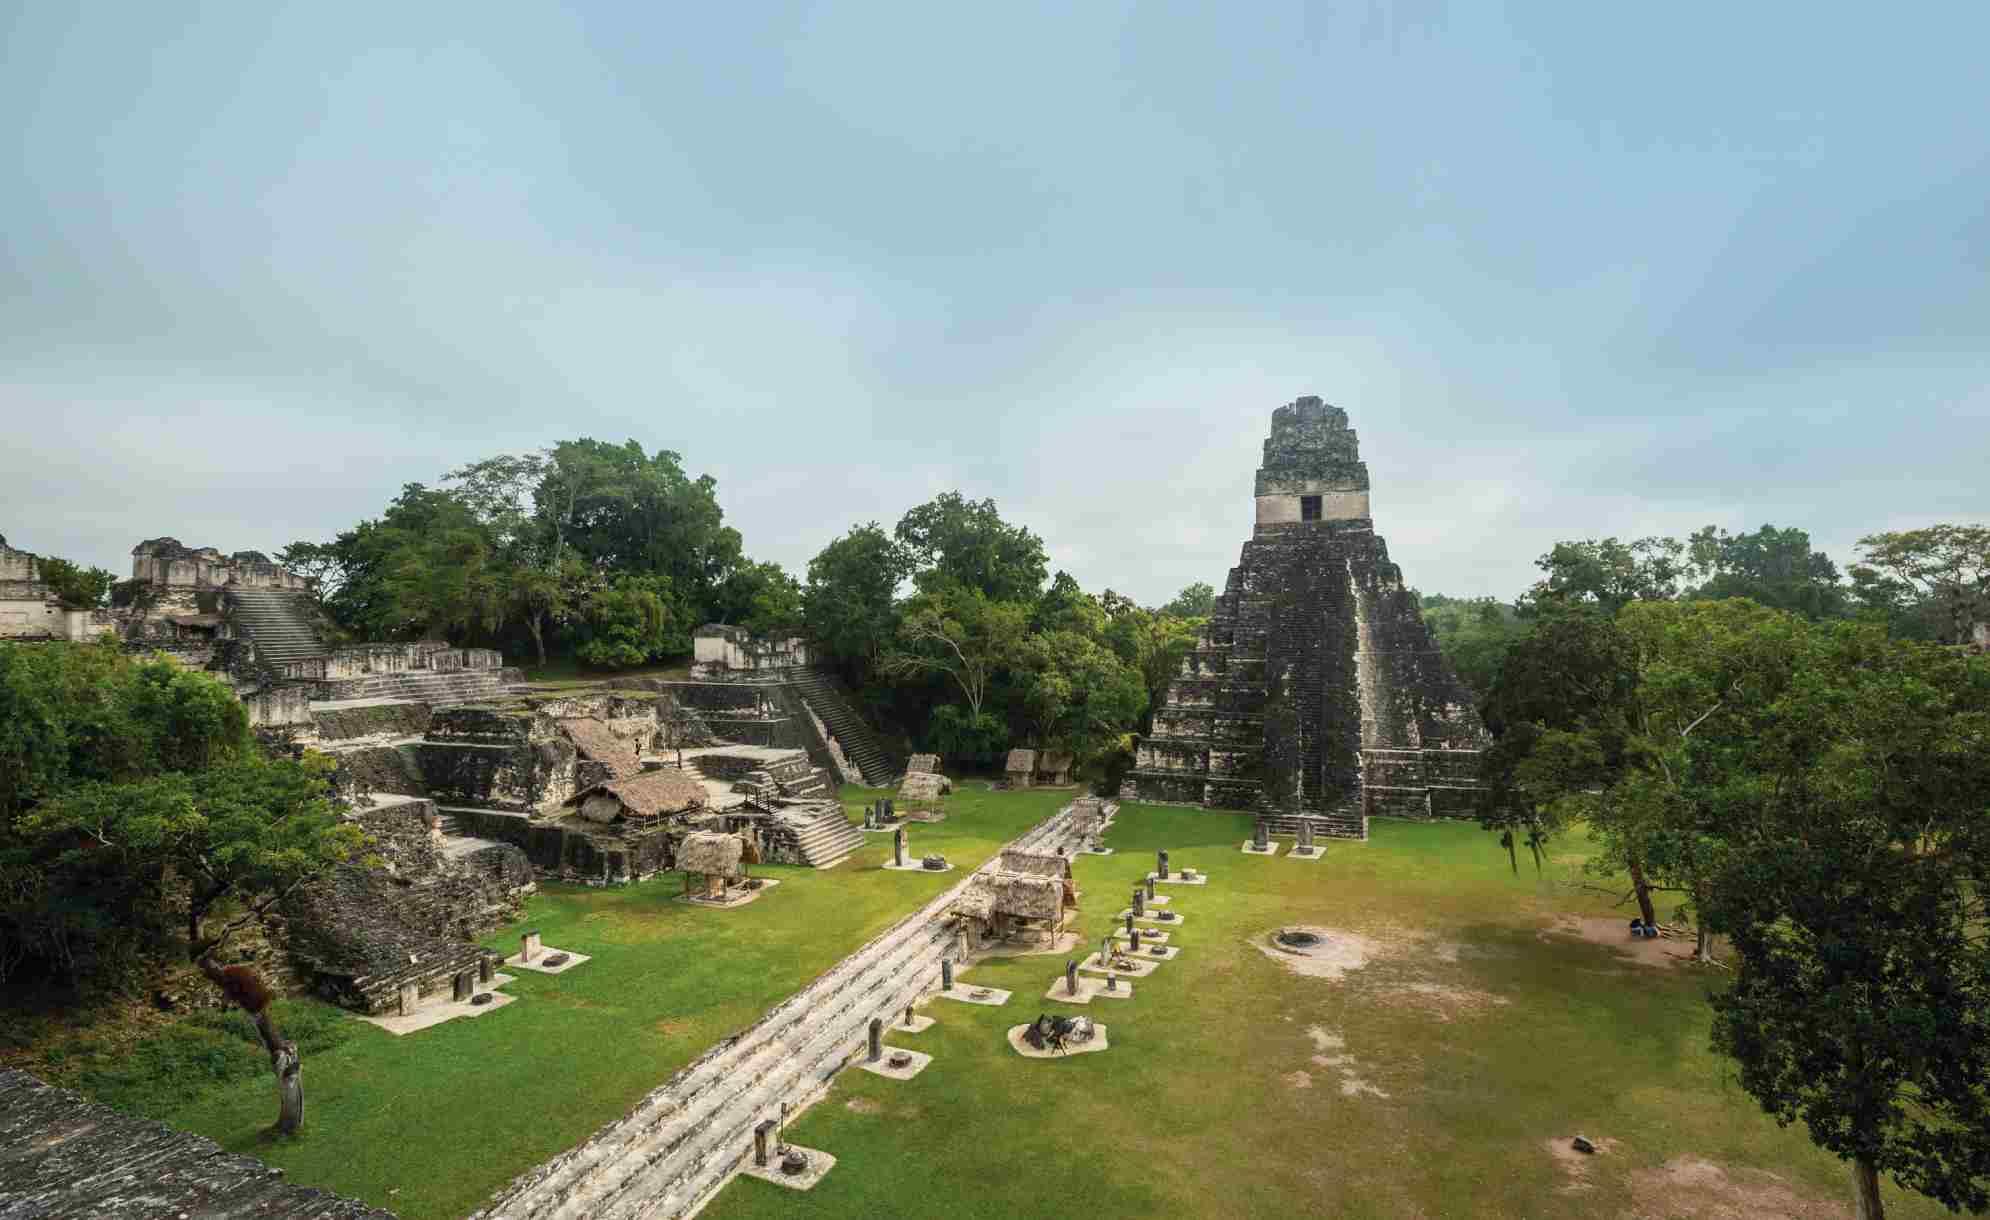 Mayan Pyramids in Tikal, Guatemala